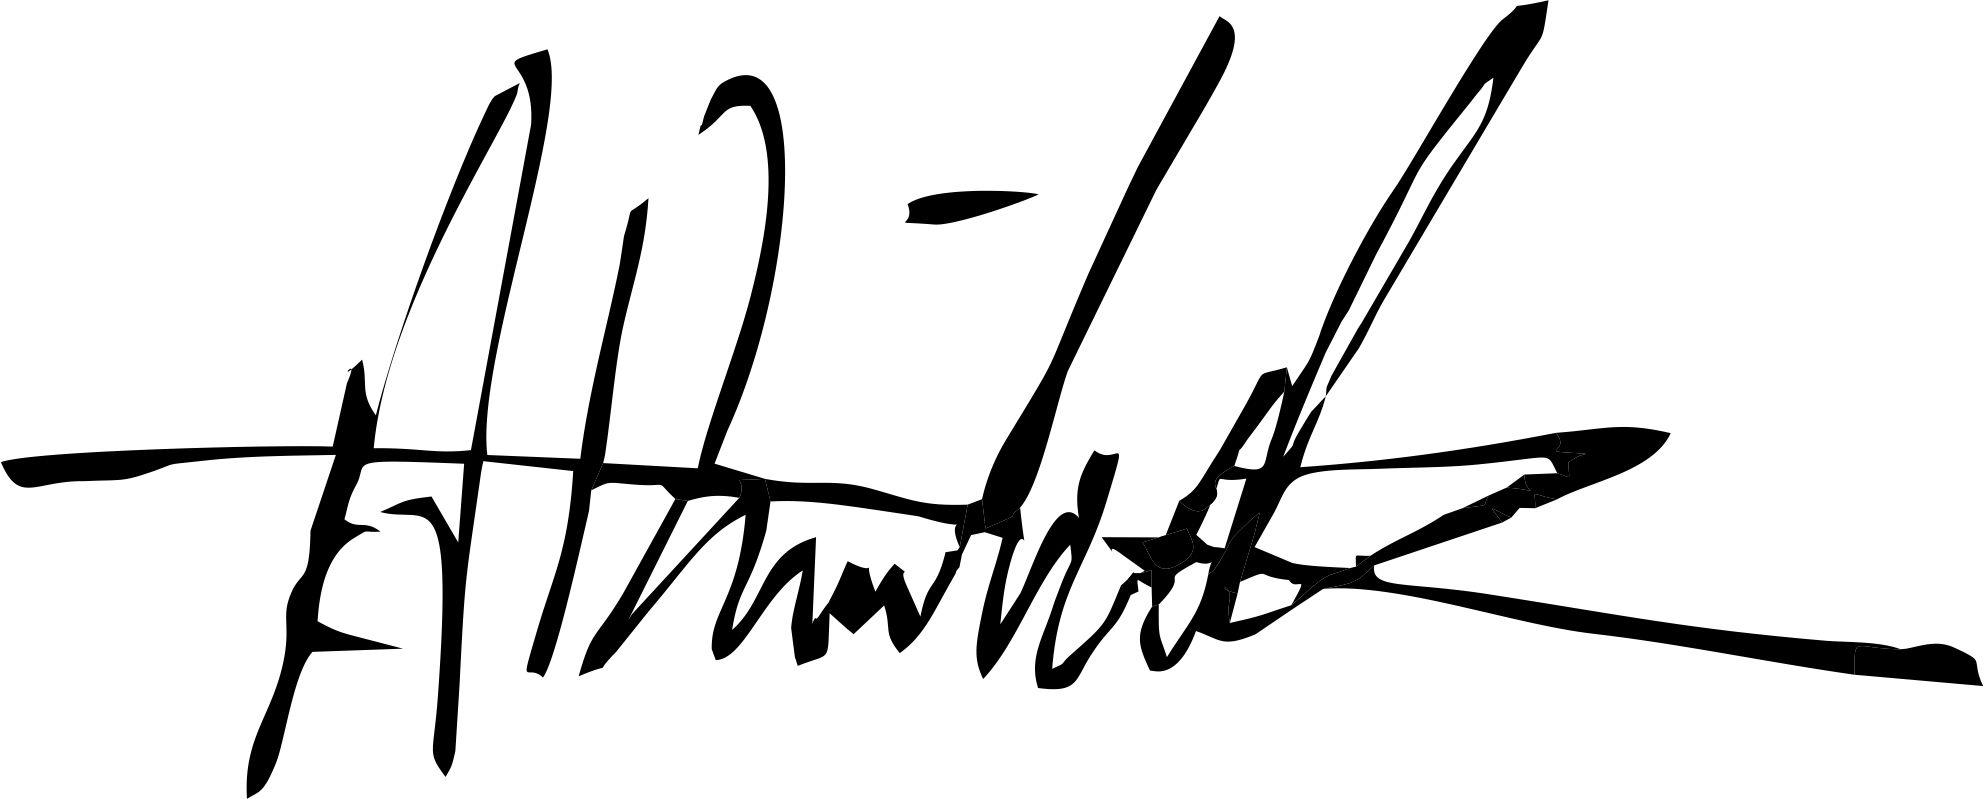 Ann-Marie Drinkell's Signature